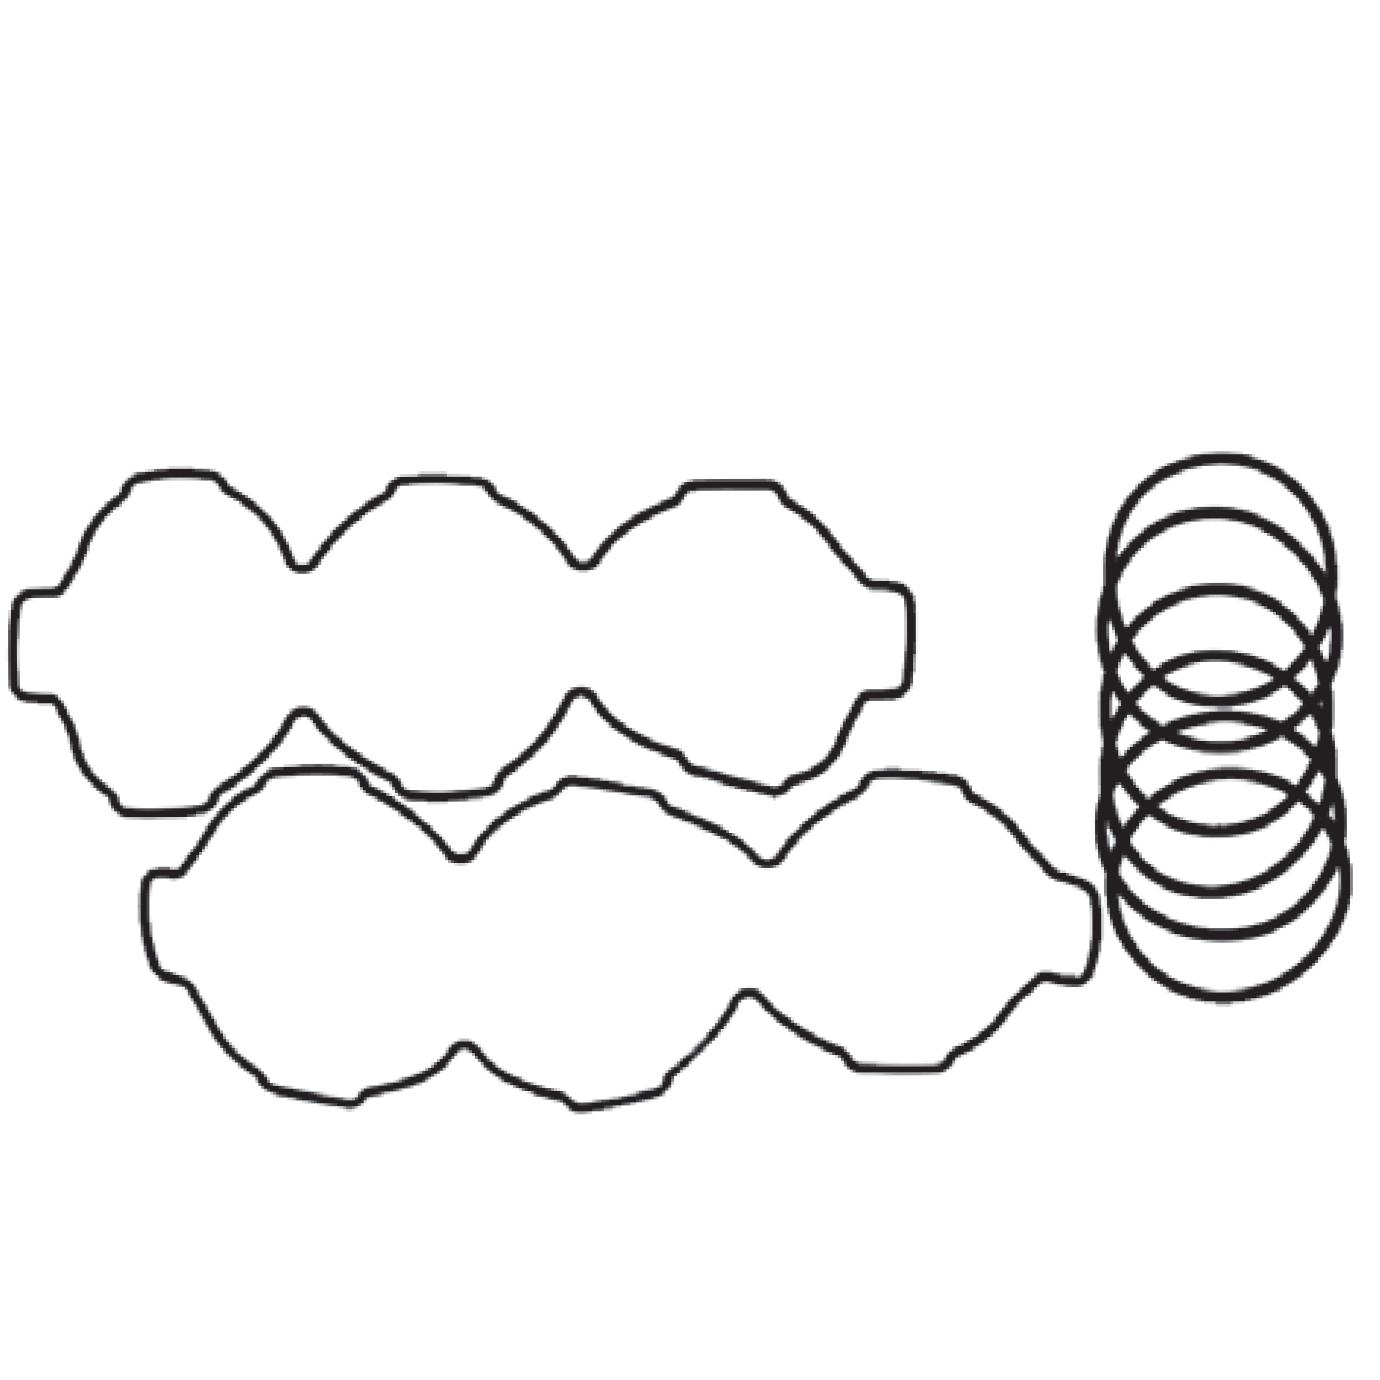 category-merc-head-o-ring-kit.png